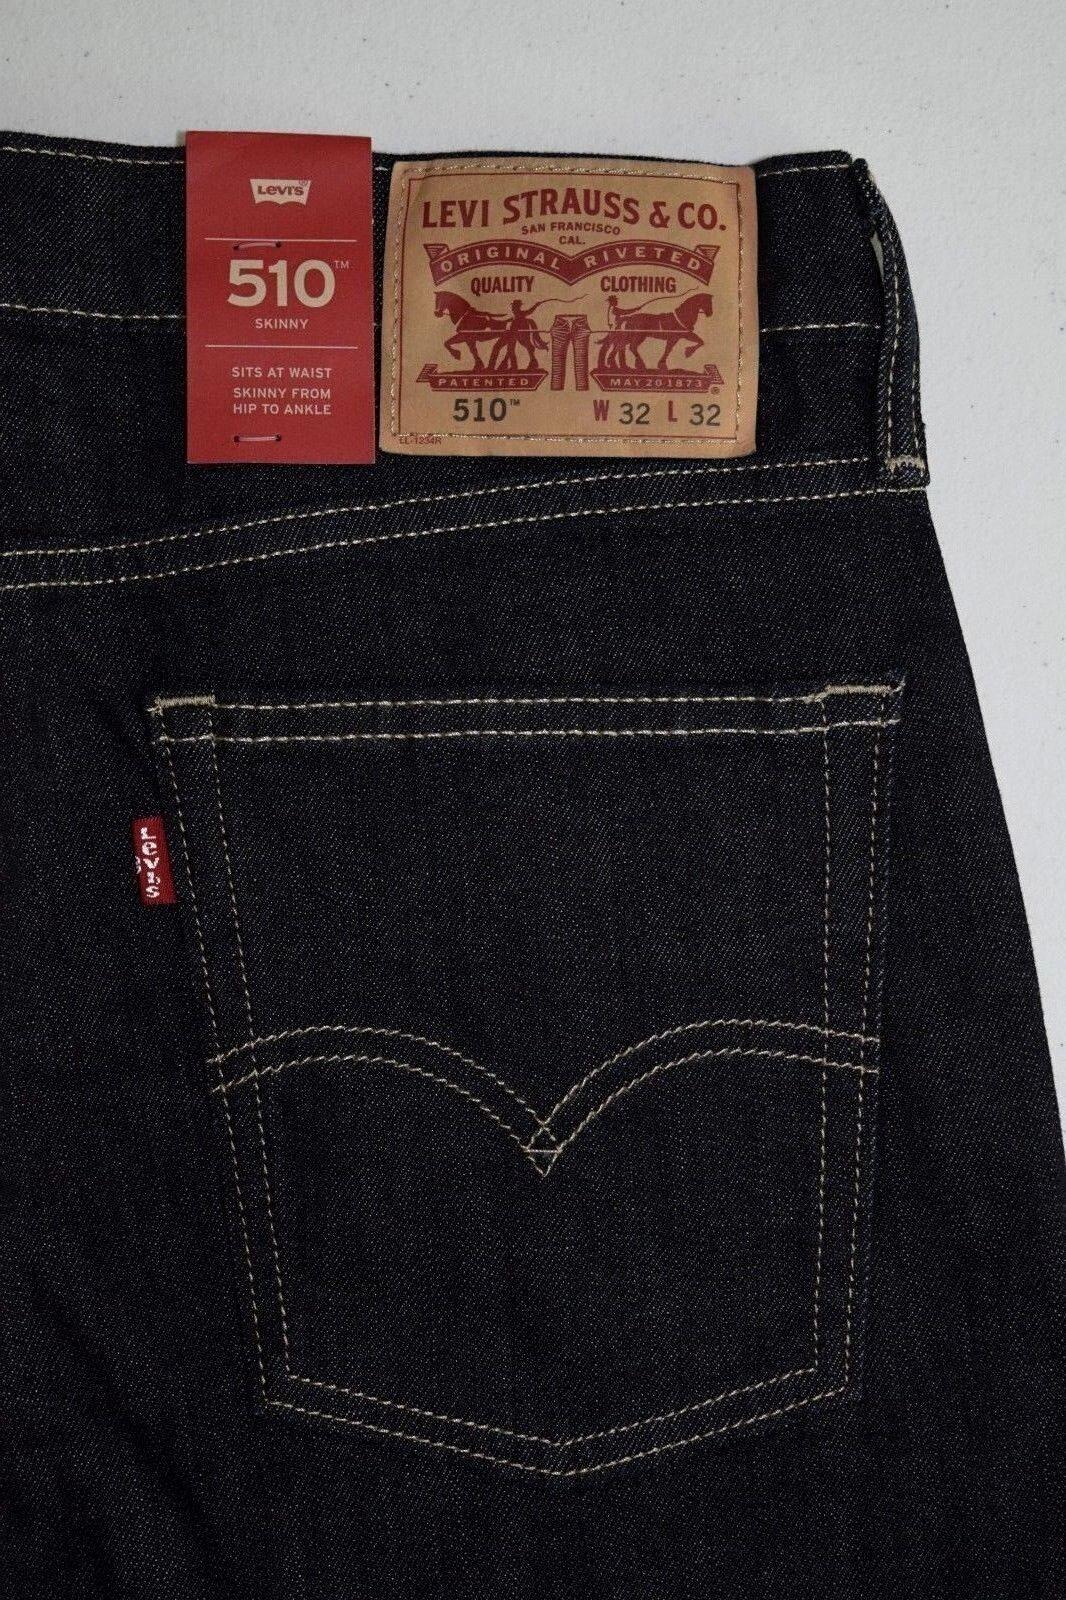 DARK DENIM Levi's 510 Skinny Fit STRETCH Jeans 622090024